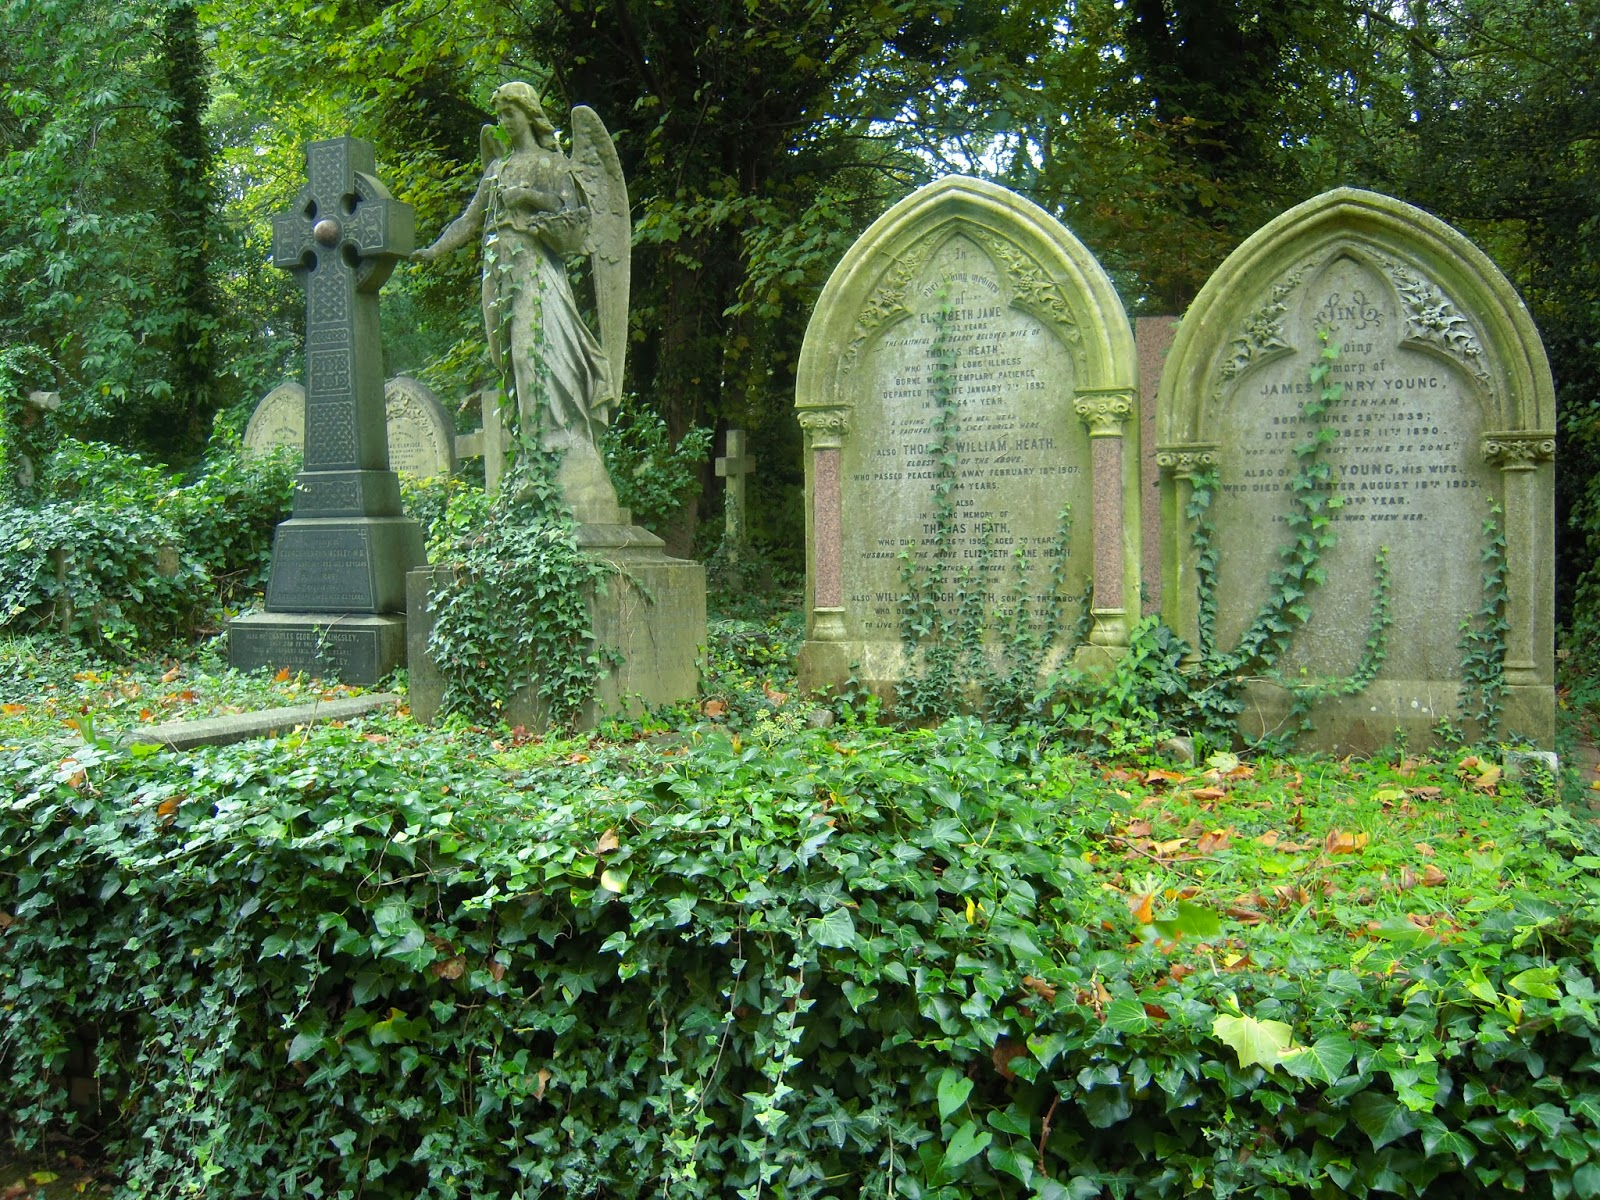 BillionGraves, gravestone, grave, damaged gravestones, cemetery, family history, ancestors, community service project, JustServe, BillionGraves app, ivy, plant growth, JustServe